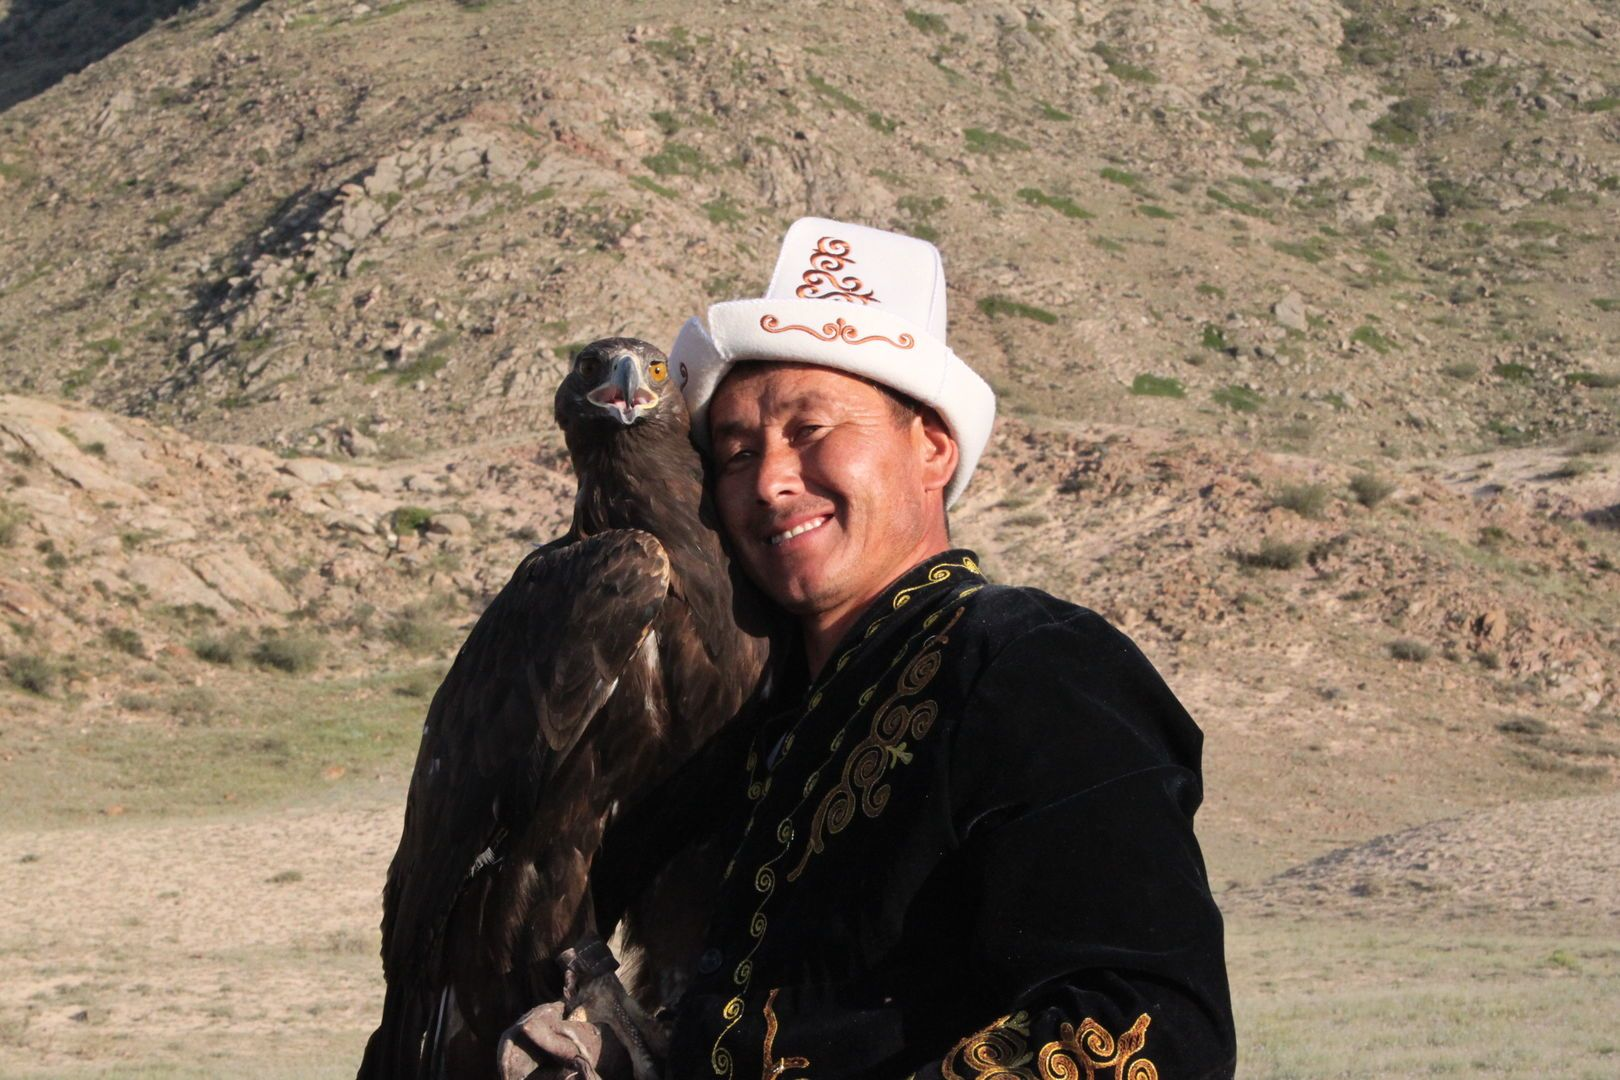 kyrgyz eagle hunter holding his eagle